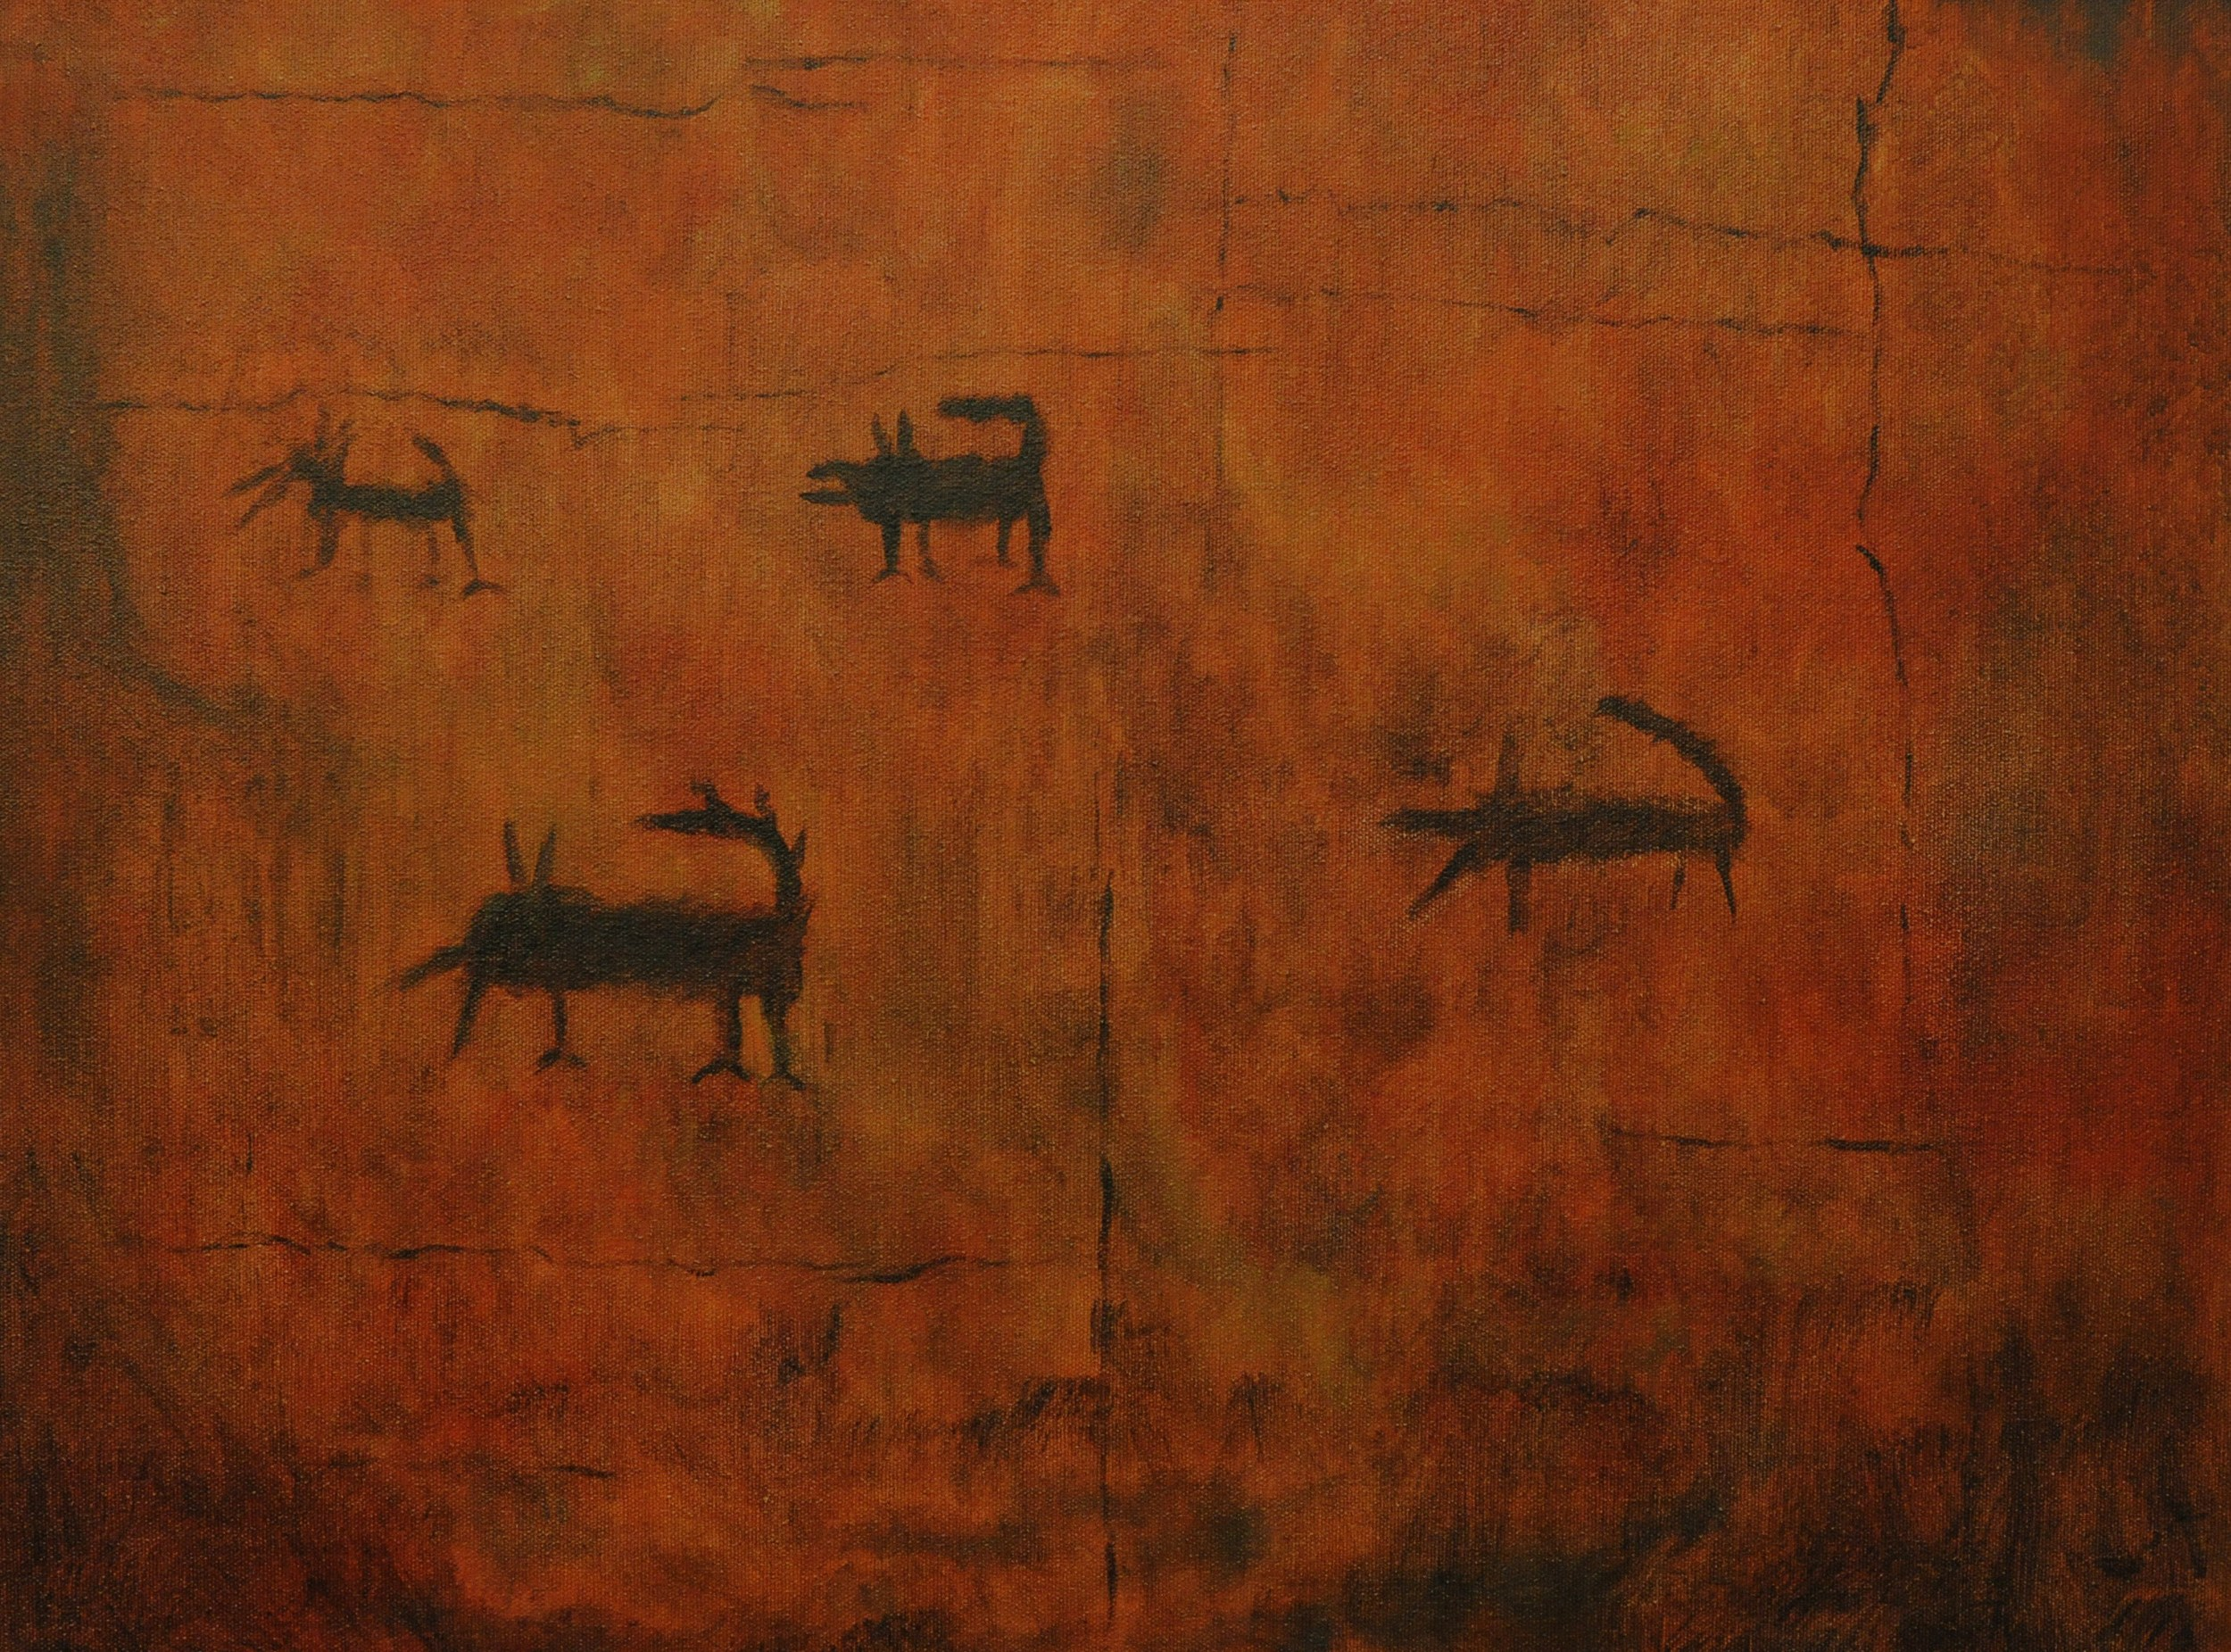 Prehistoric Cave Art, Tennessee, Ca 1300 AD